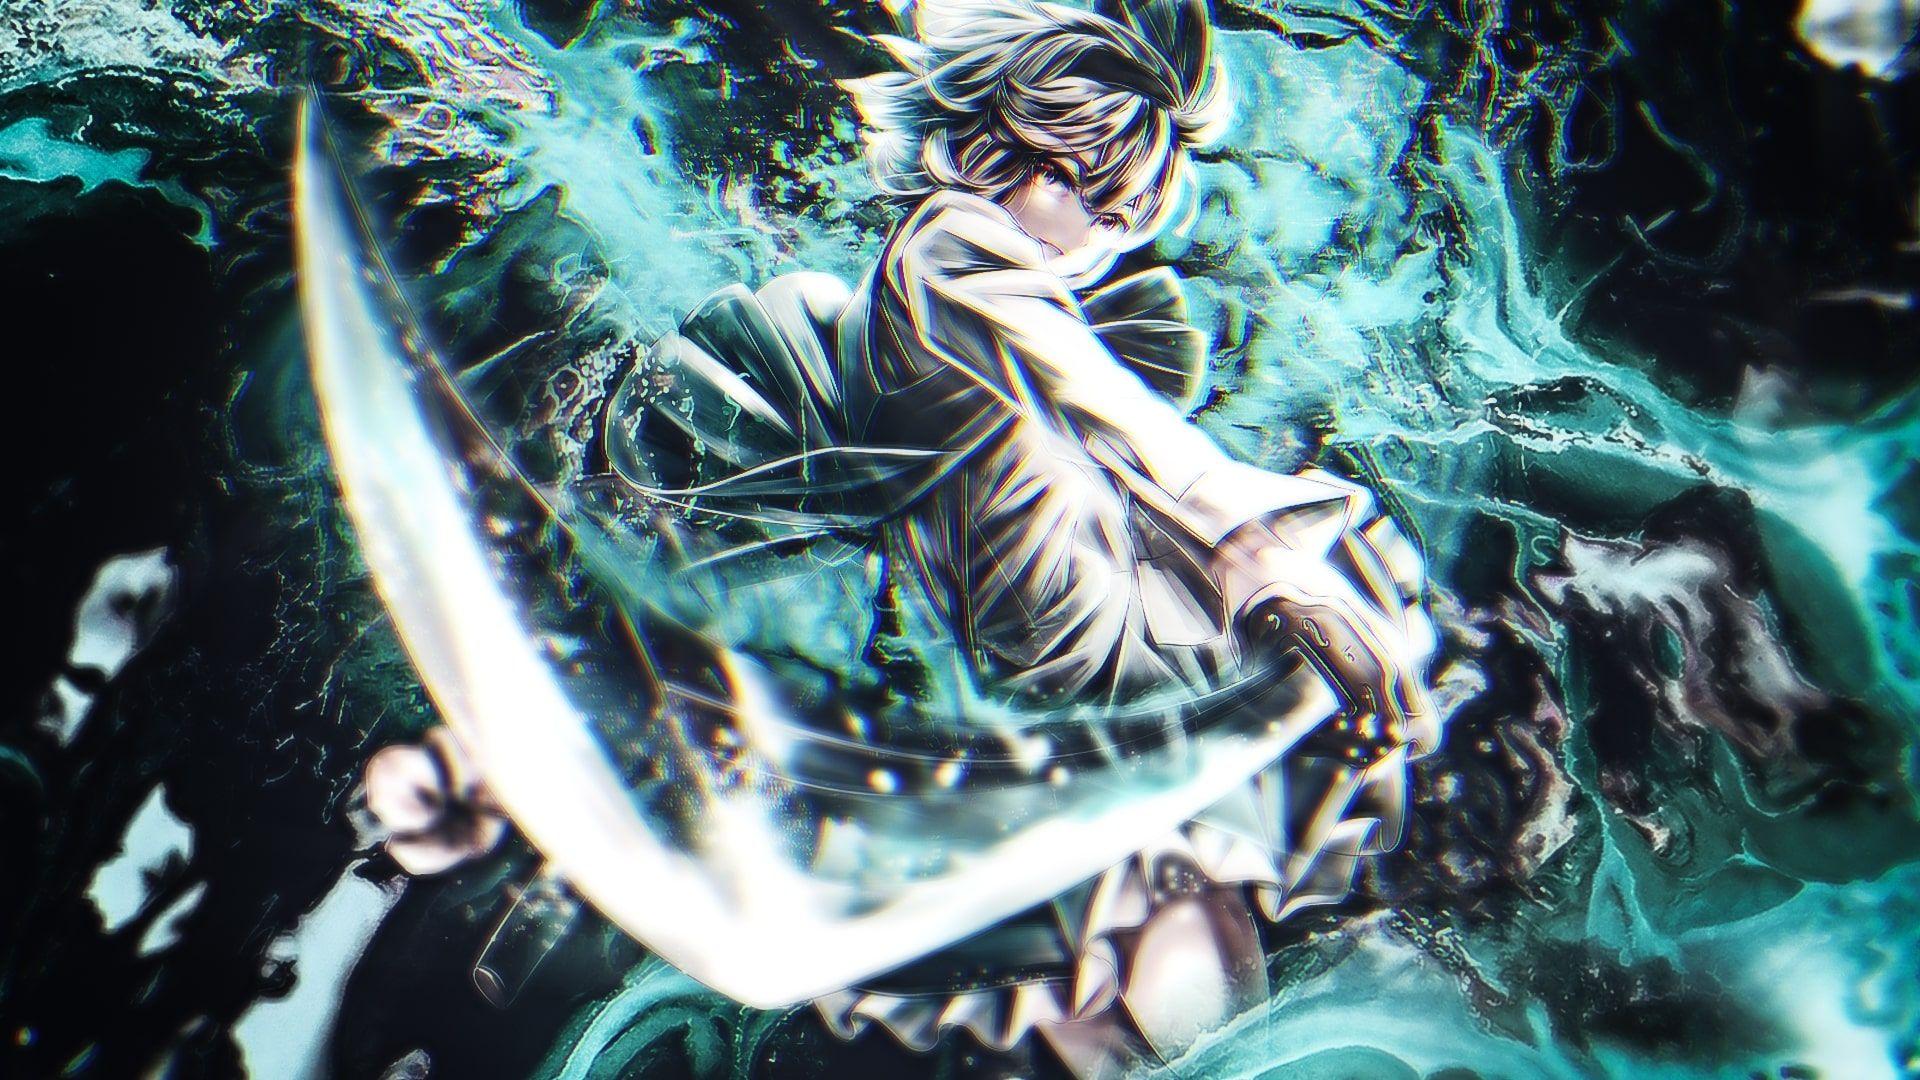 Anime Sword Badass Wallpapers - Wallpaper Cave